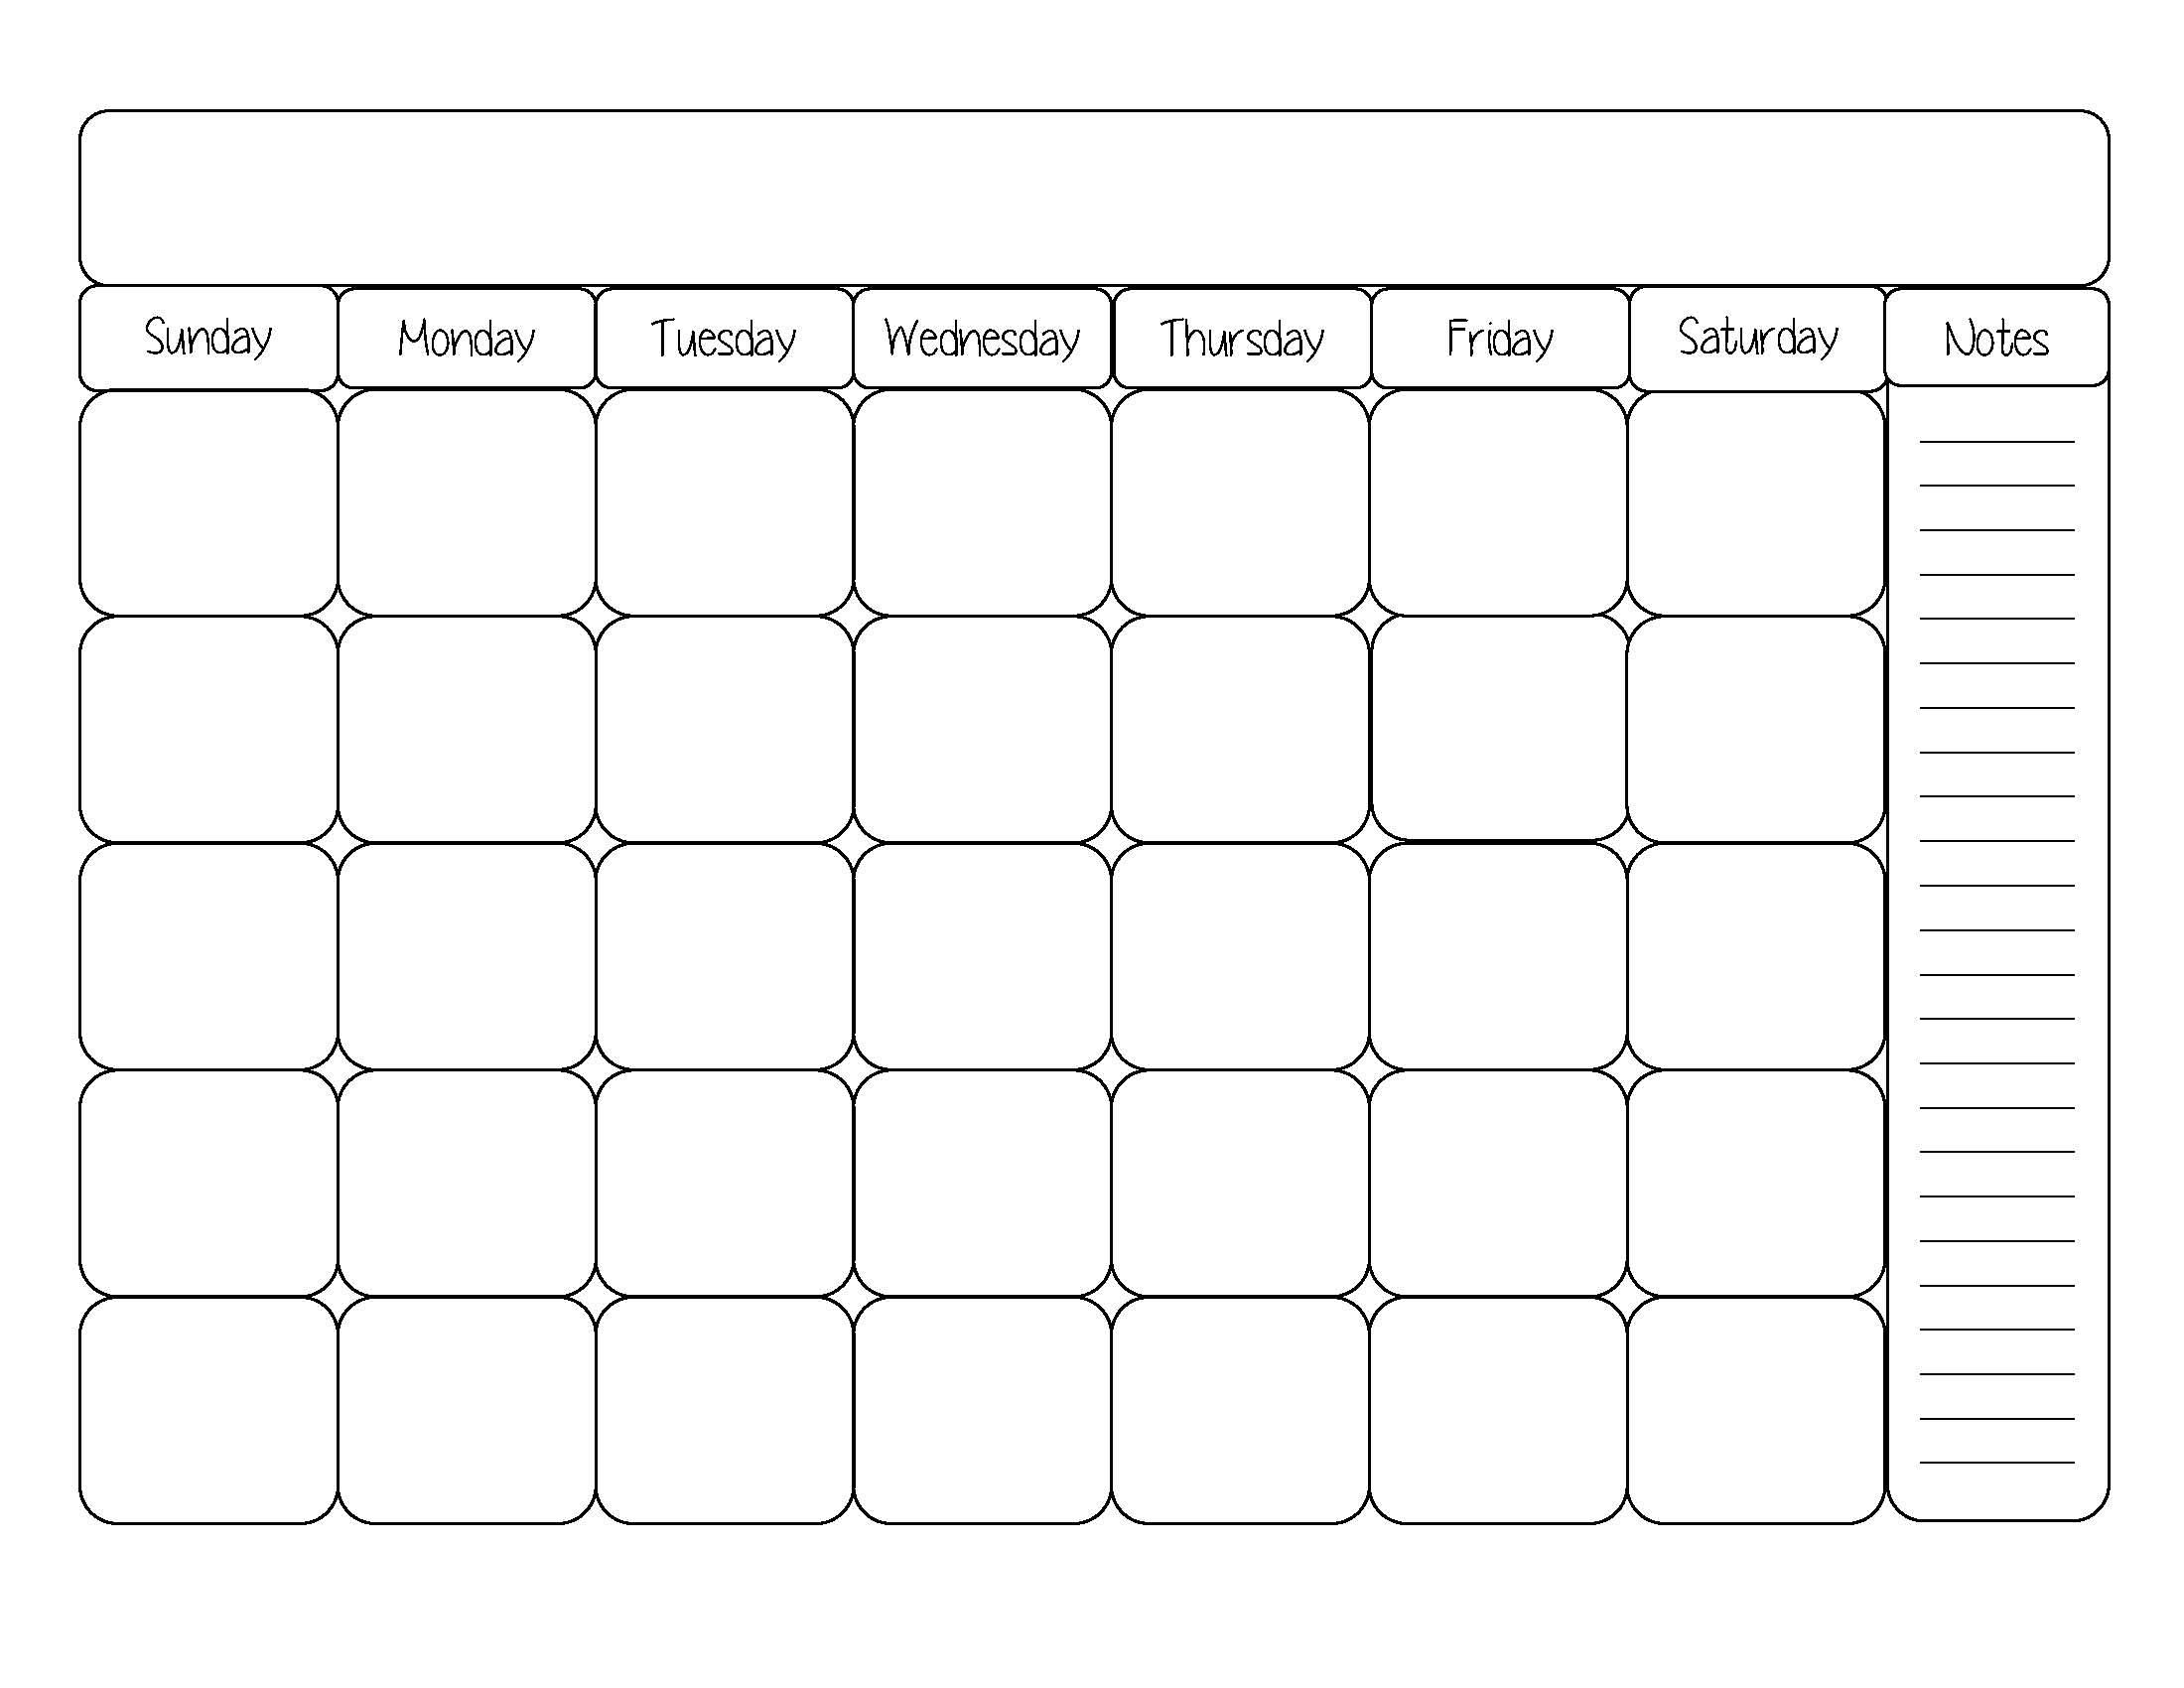 Saturday clipart calendar page #3